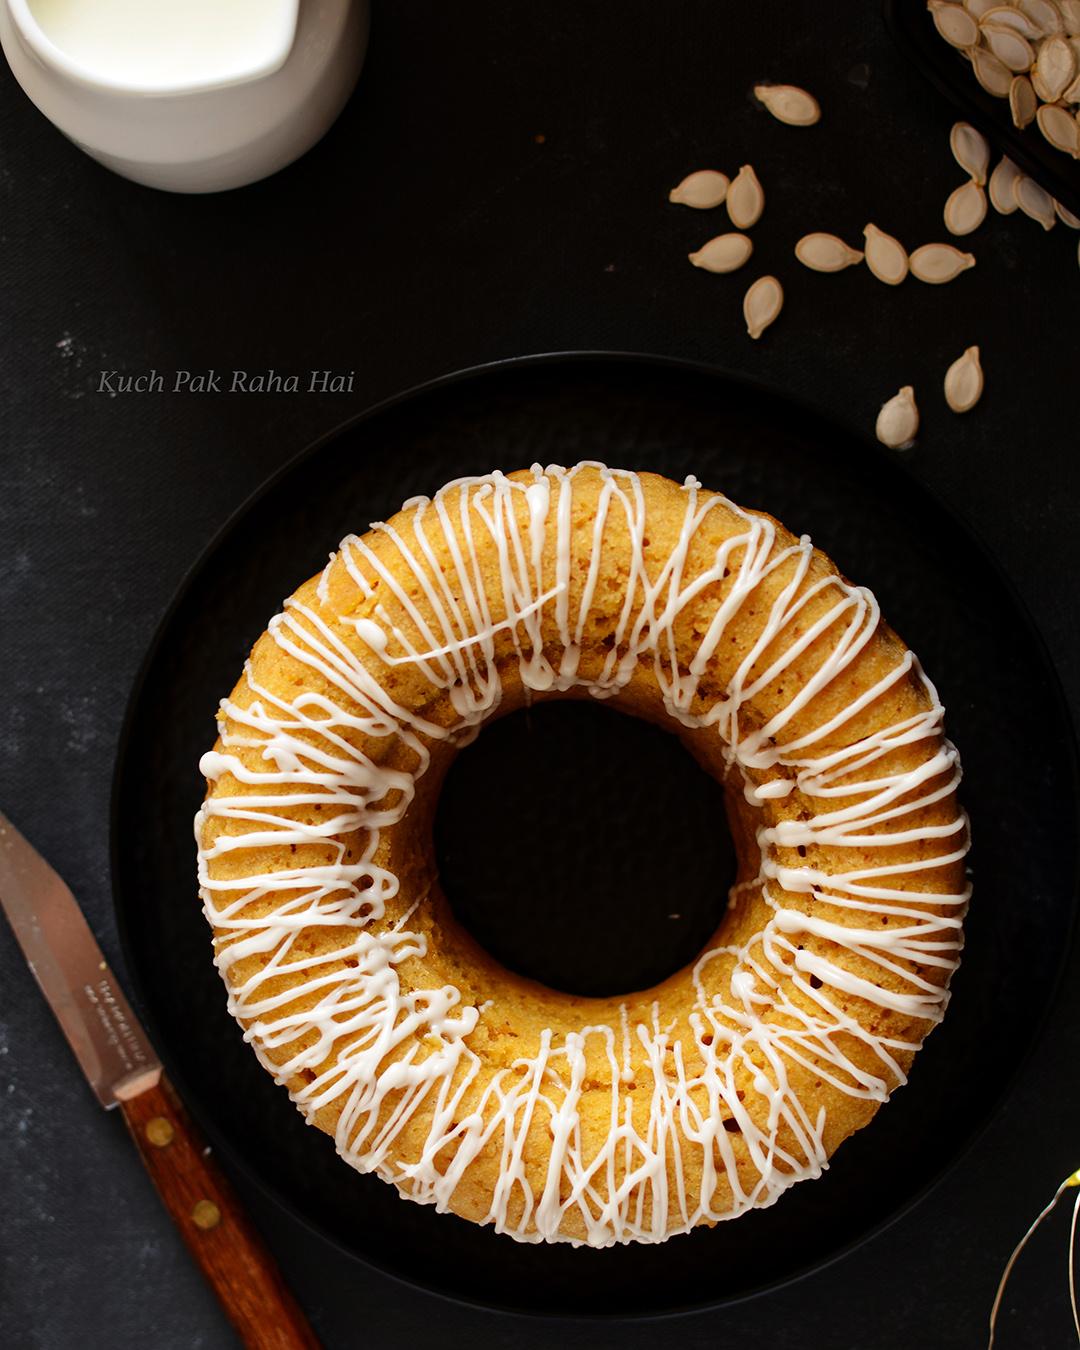 Eggless Pumpkin Cake easy recipe using pumpkin puree